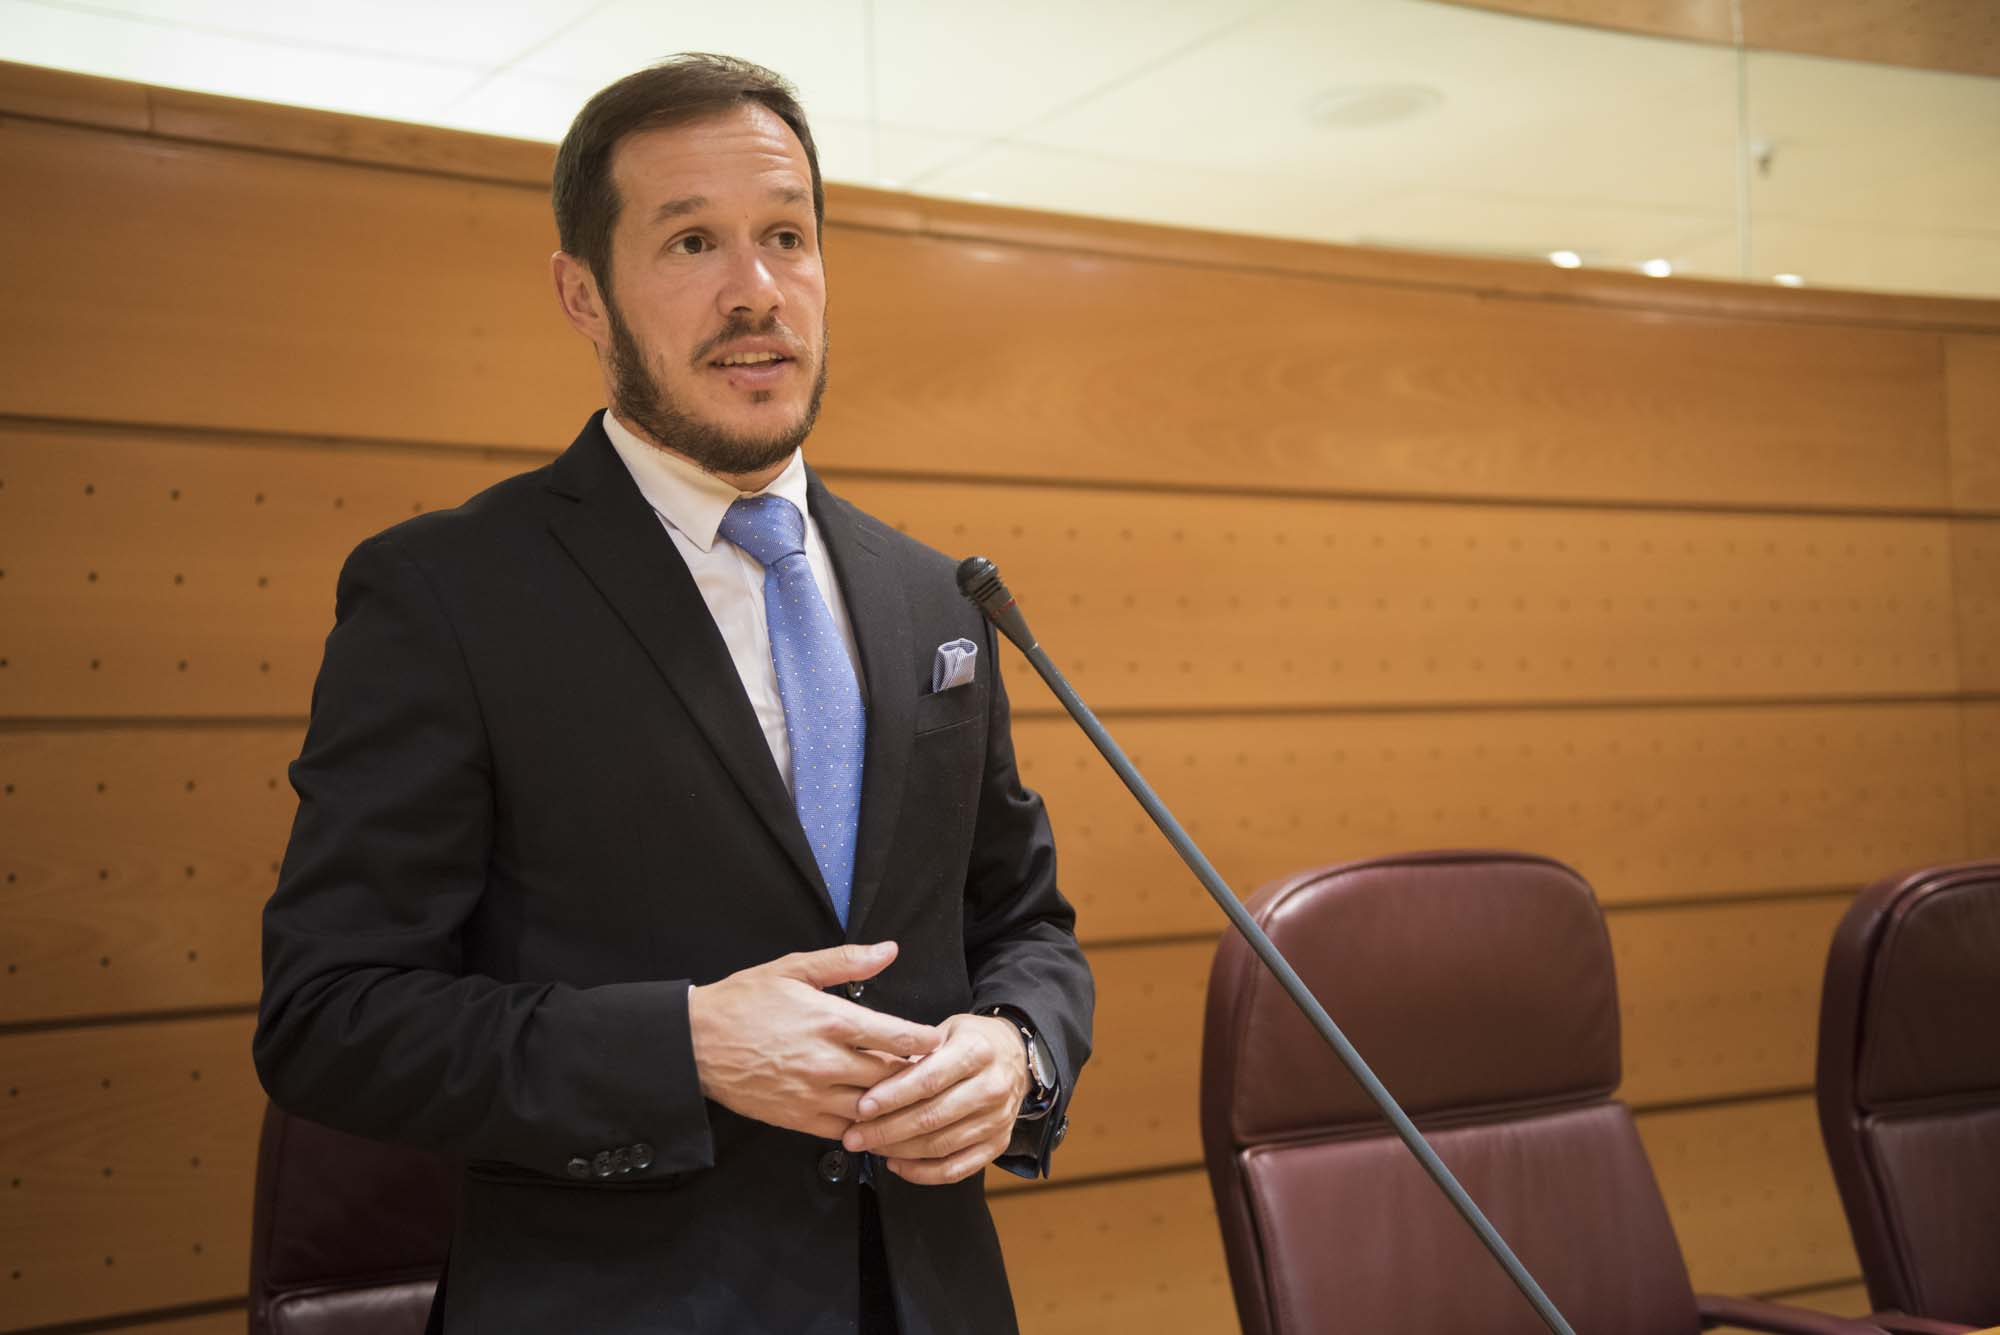 080217-016- Mariano Hernandez Zapata Senado Madrid ©CarlosAciego